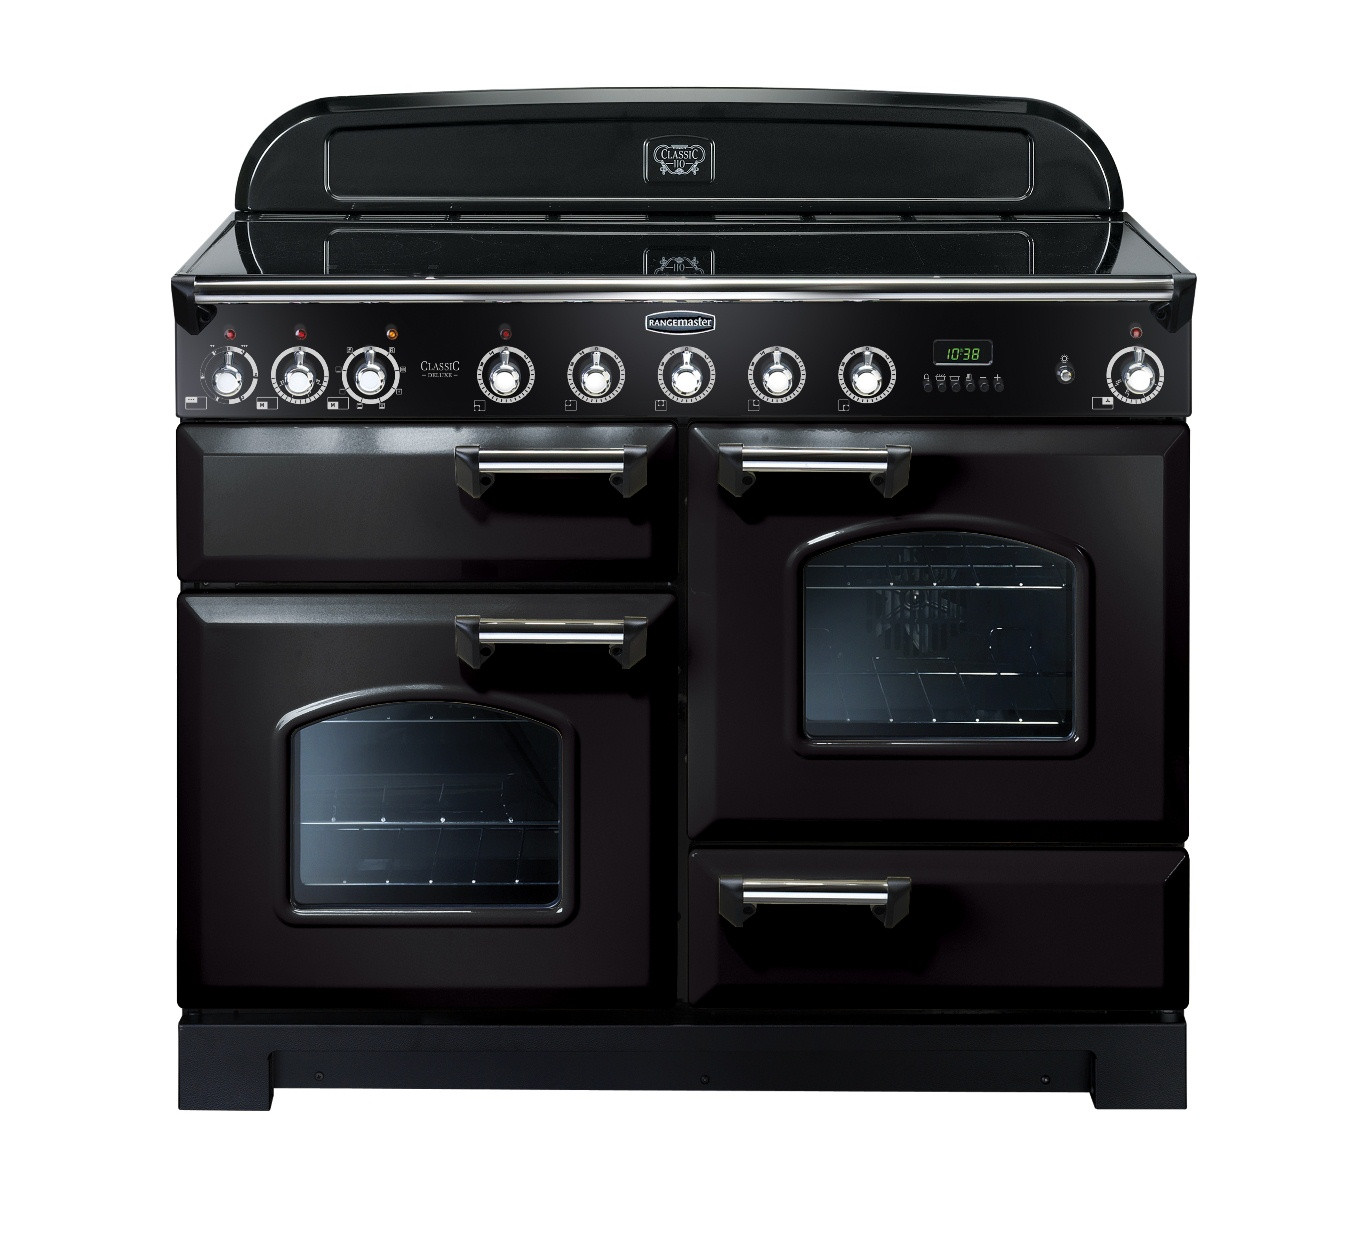 Rangemaster Classic Deluxe 110 Ceramic Range Cooker Black/Chrome Trim CDL110ECBL/C 81320